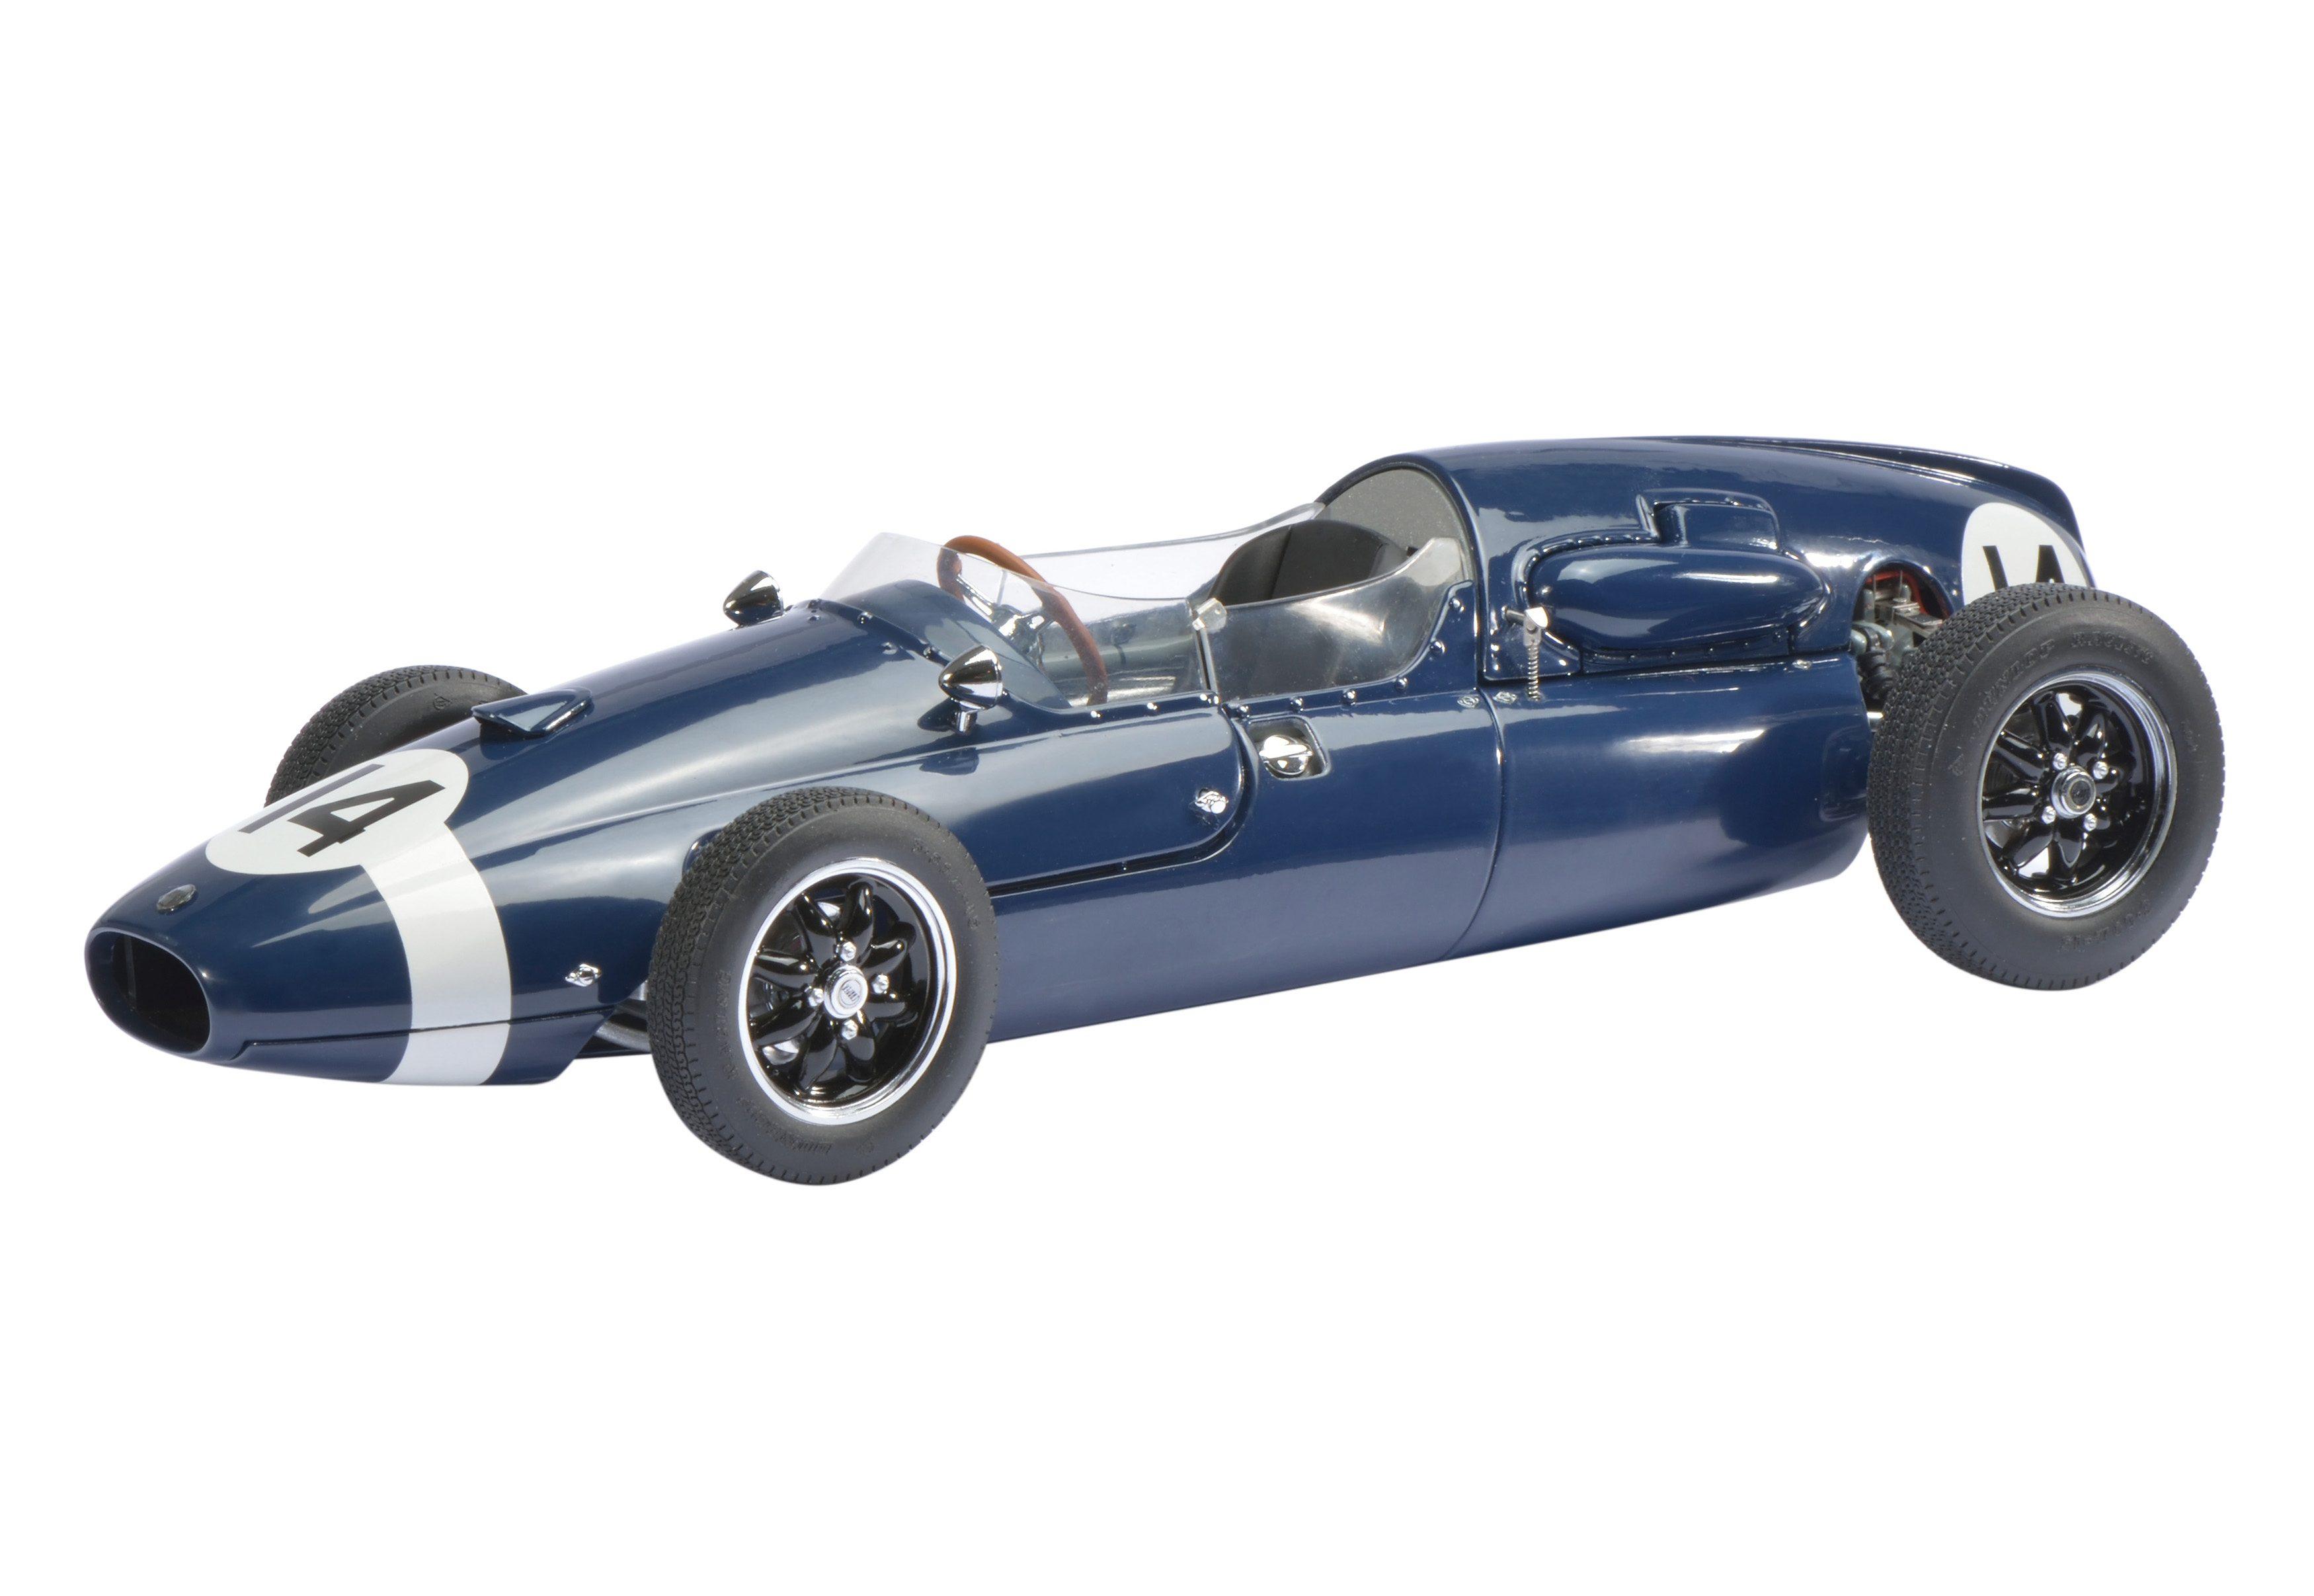 Schuco Sammlermodell Auto, Maßstab 1:18, »Cooper T51«